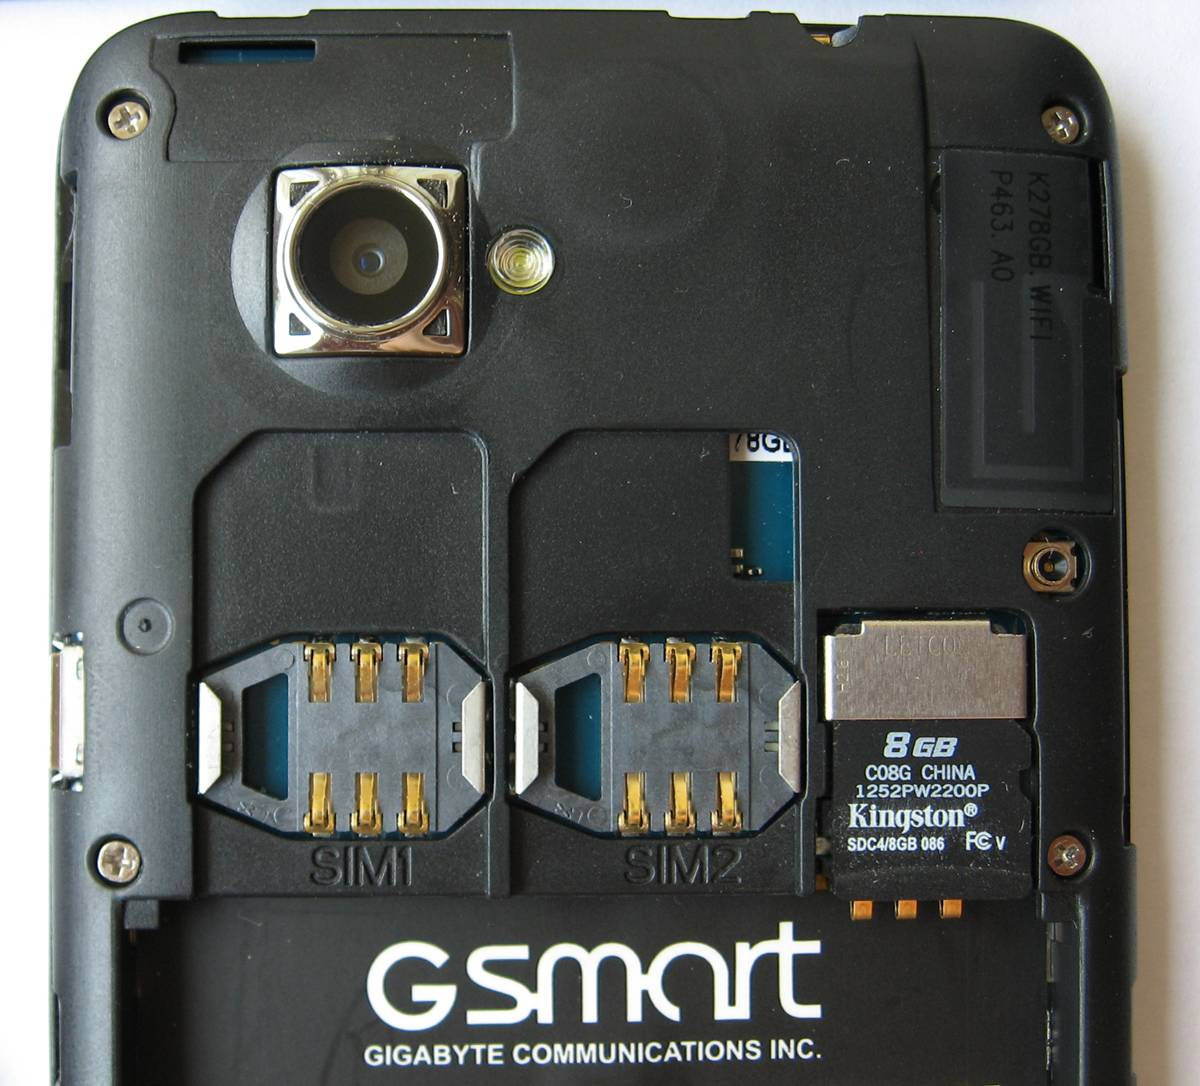 GSmart-T4-slot-cartele